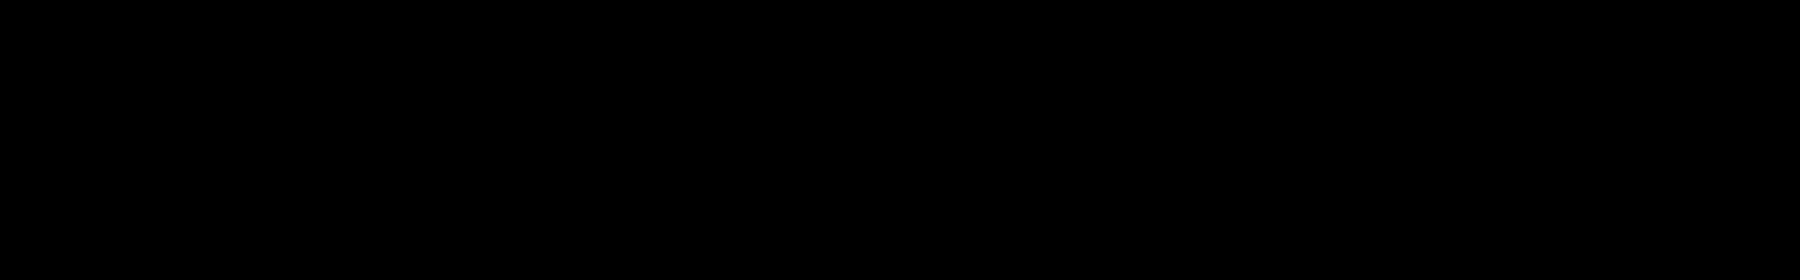 Savage: Gliding 808's audio waveform